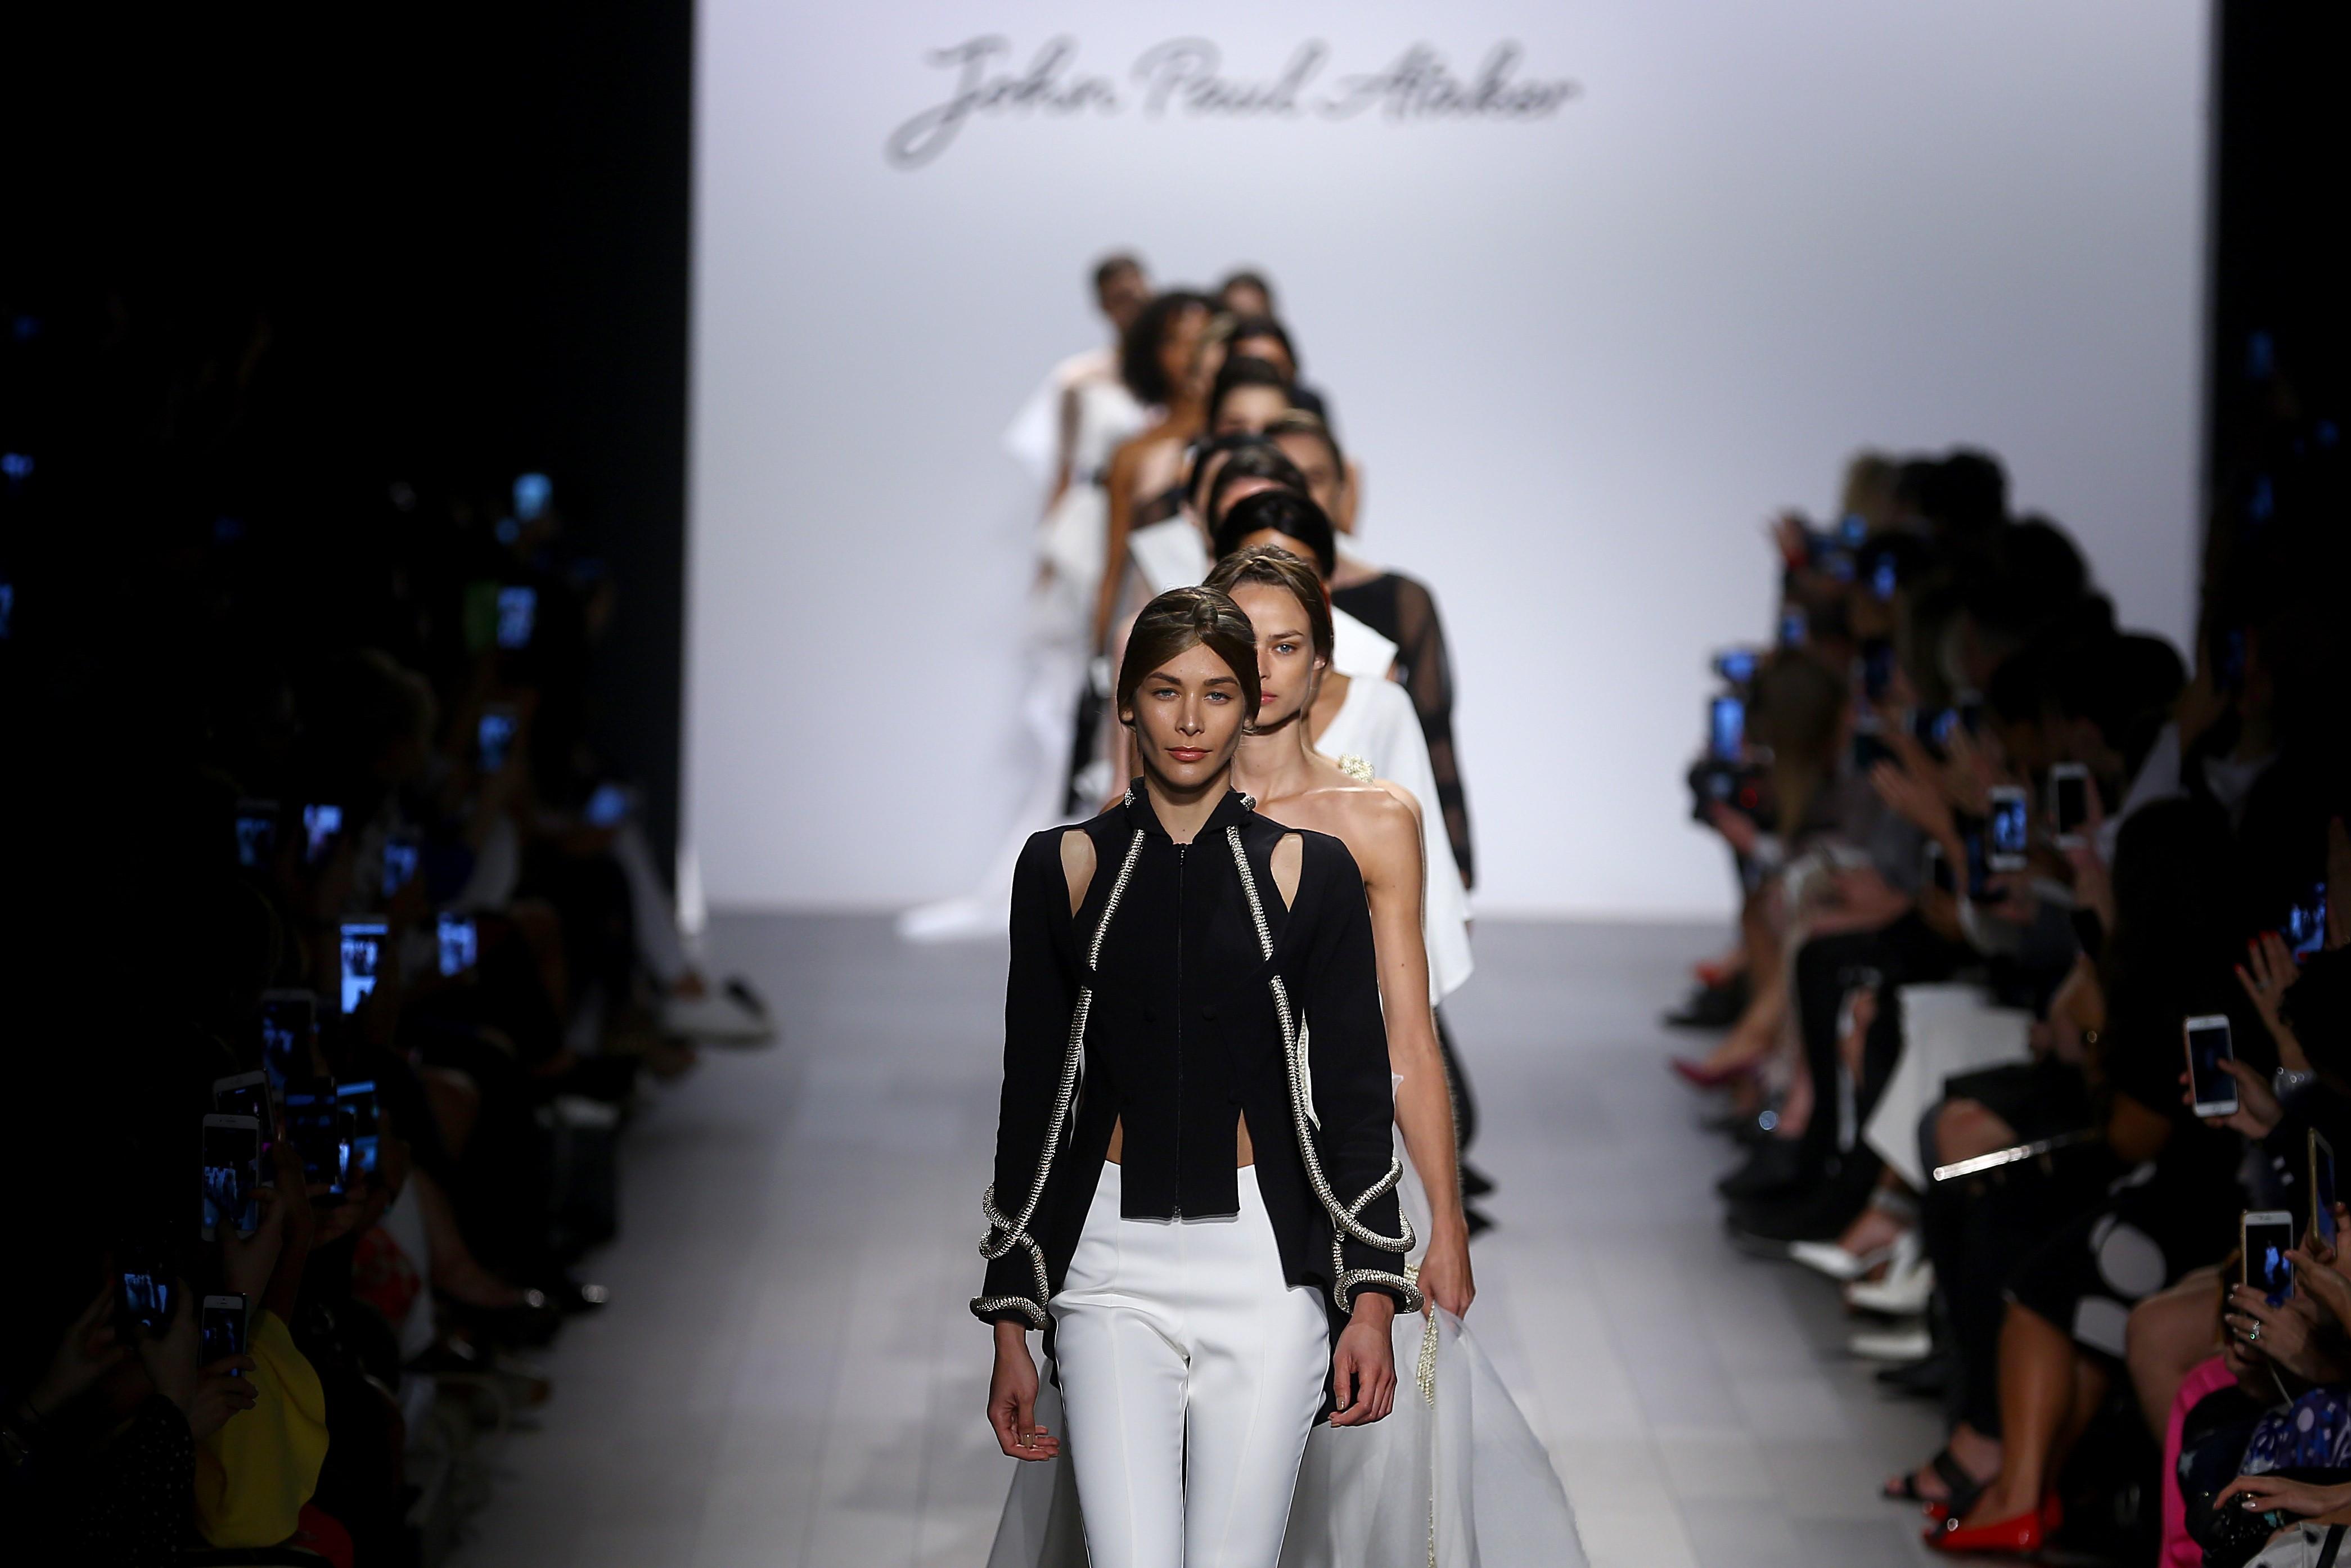 Fashion Week, New York, modelos, privacidad, acoso